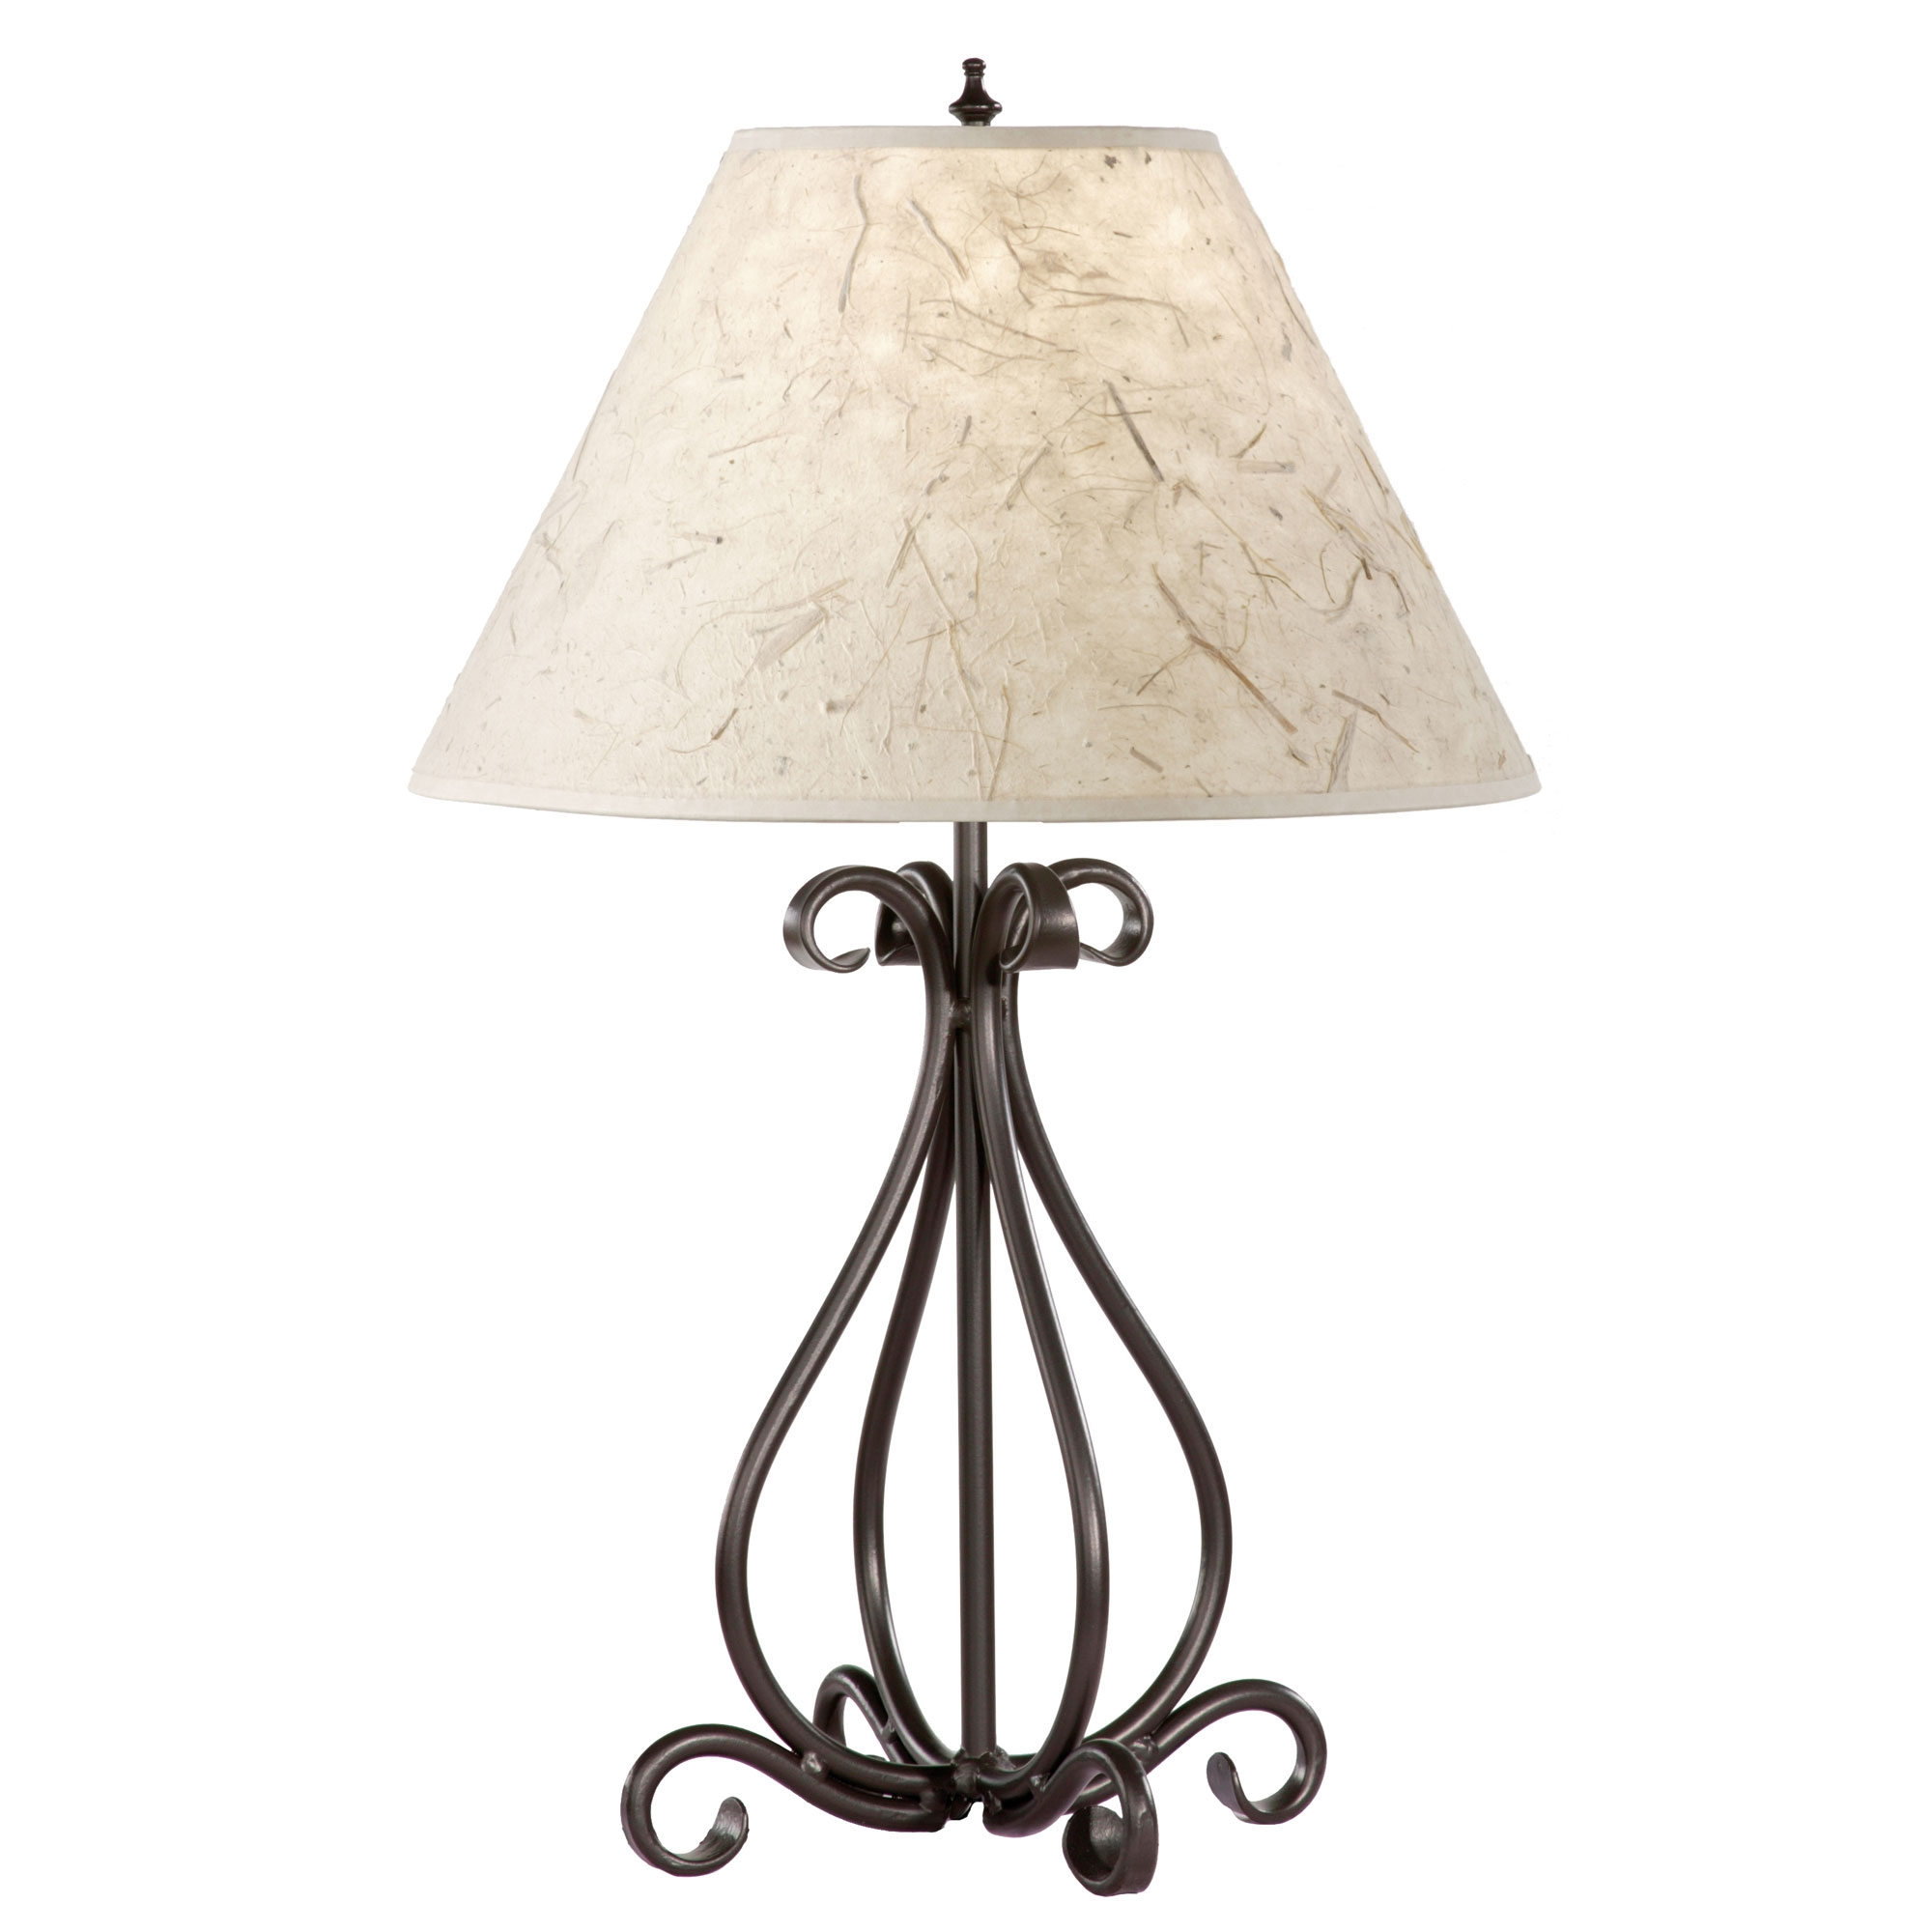 10 Benefits Of Wrought Iron Lamps Warisan Lighting